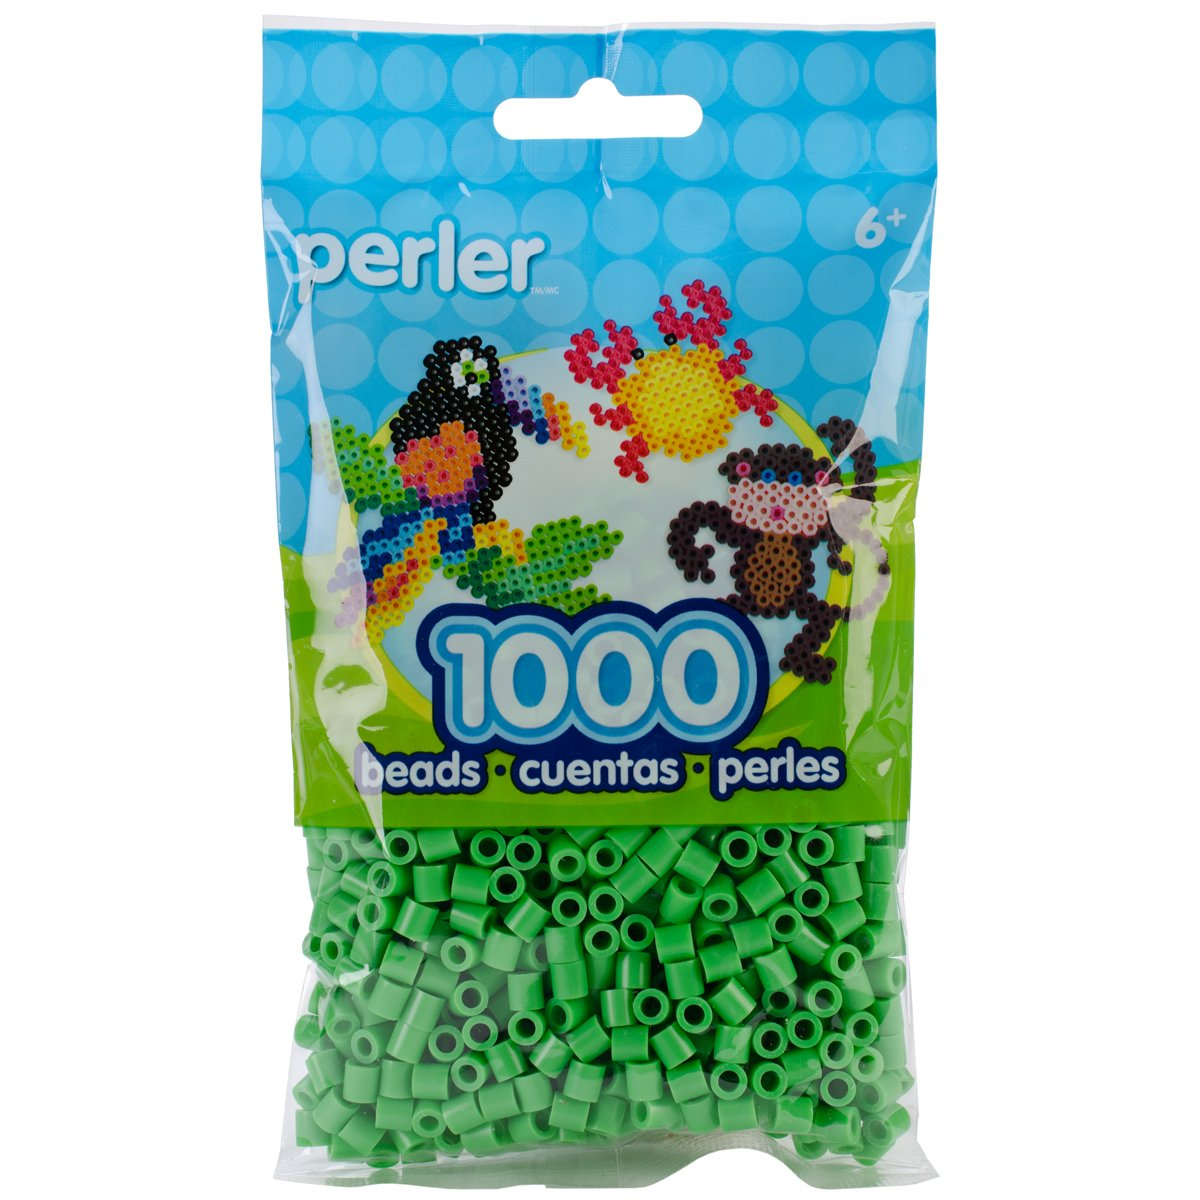 Magenta Purple Perler Beads Fuse Beads for Crafts 1000pcs